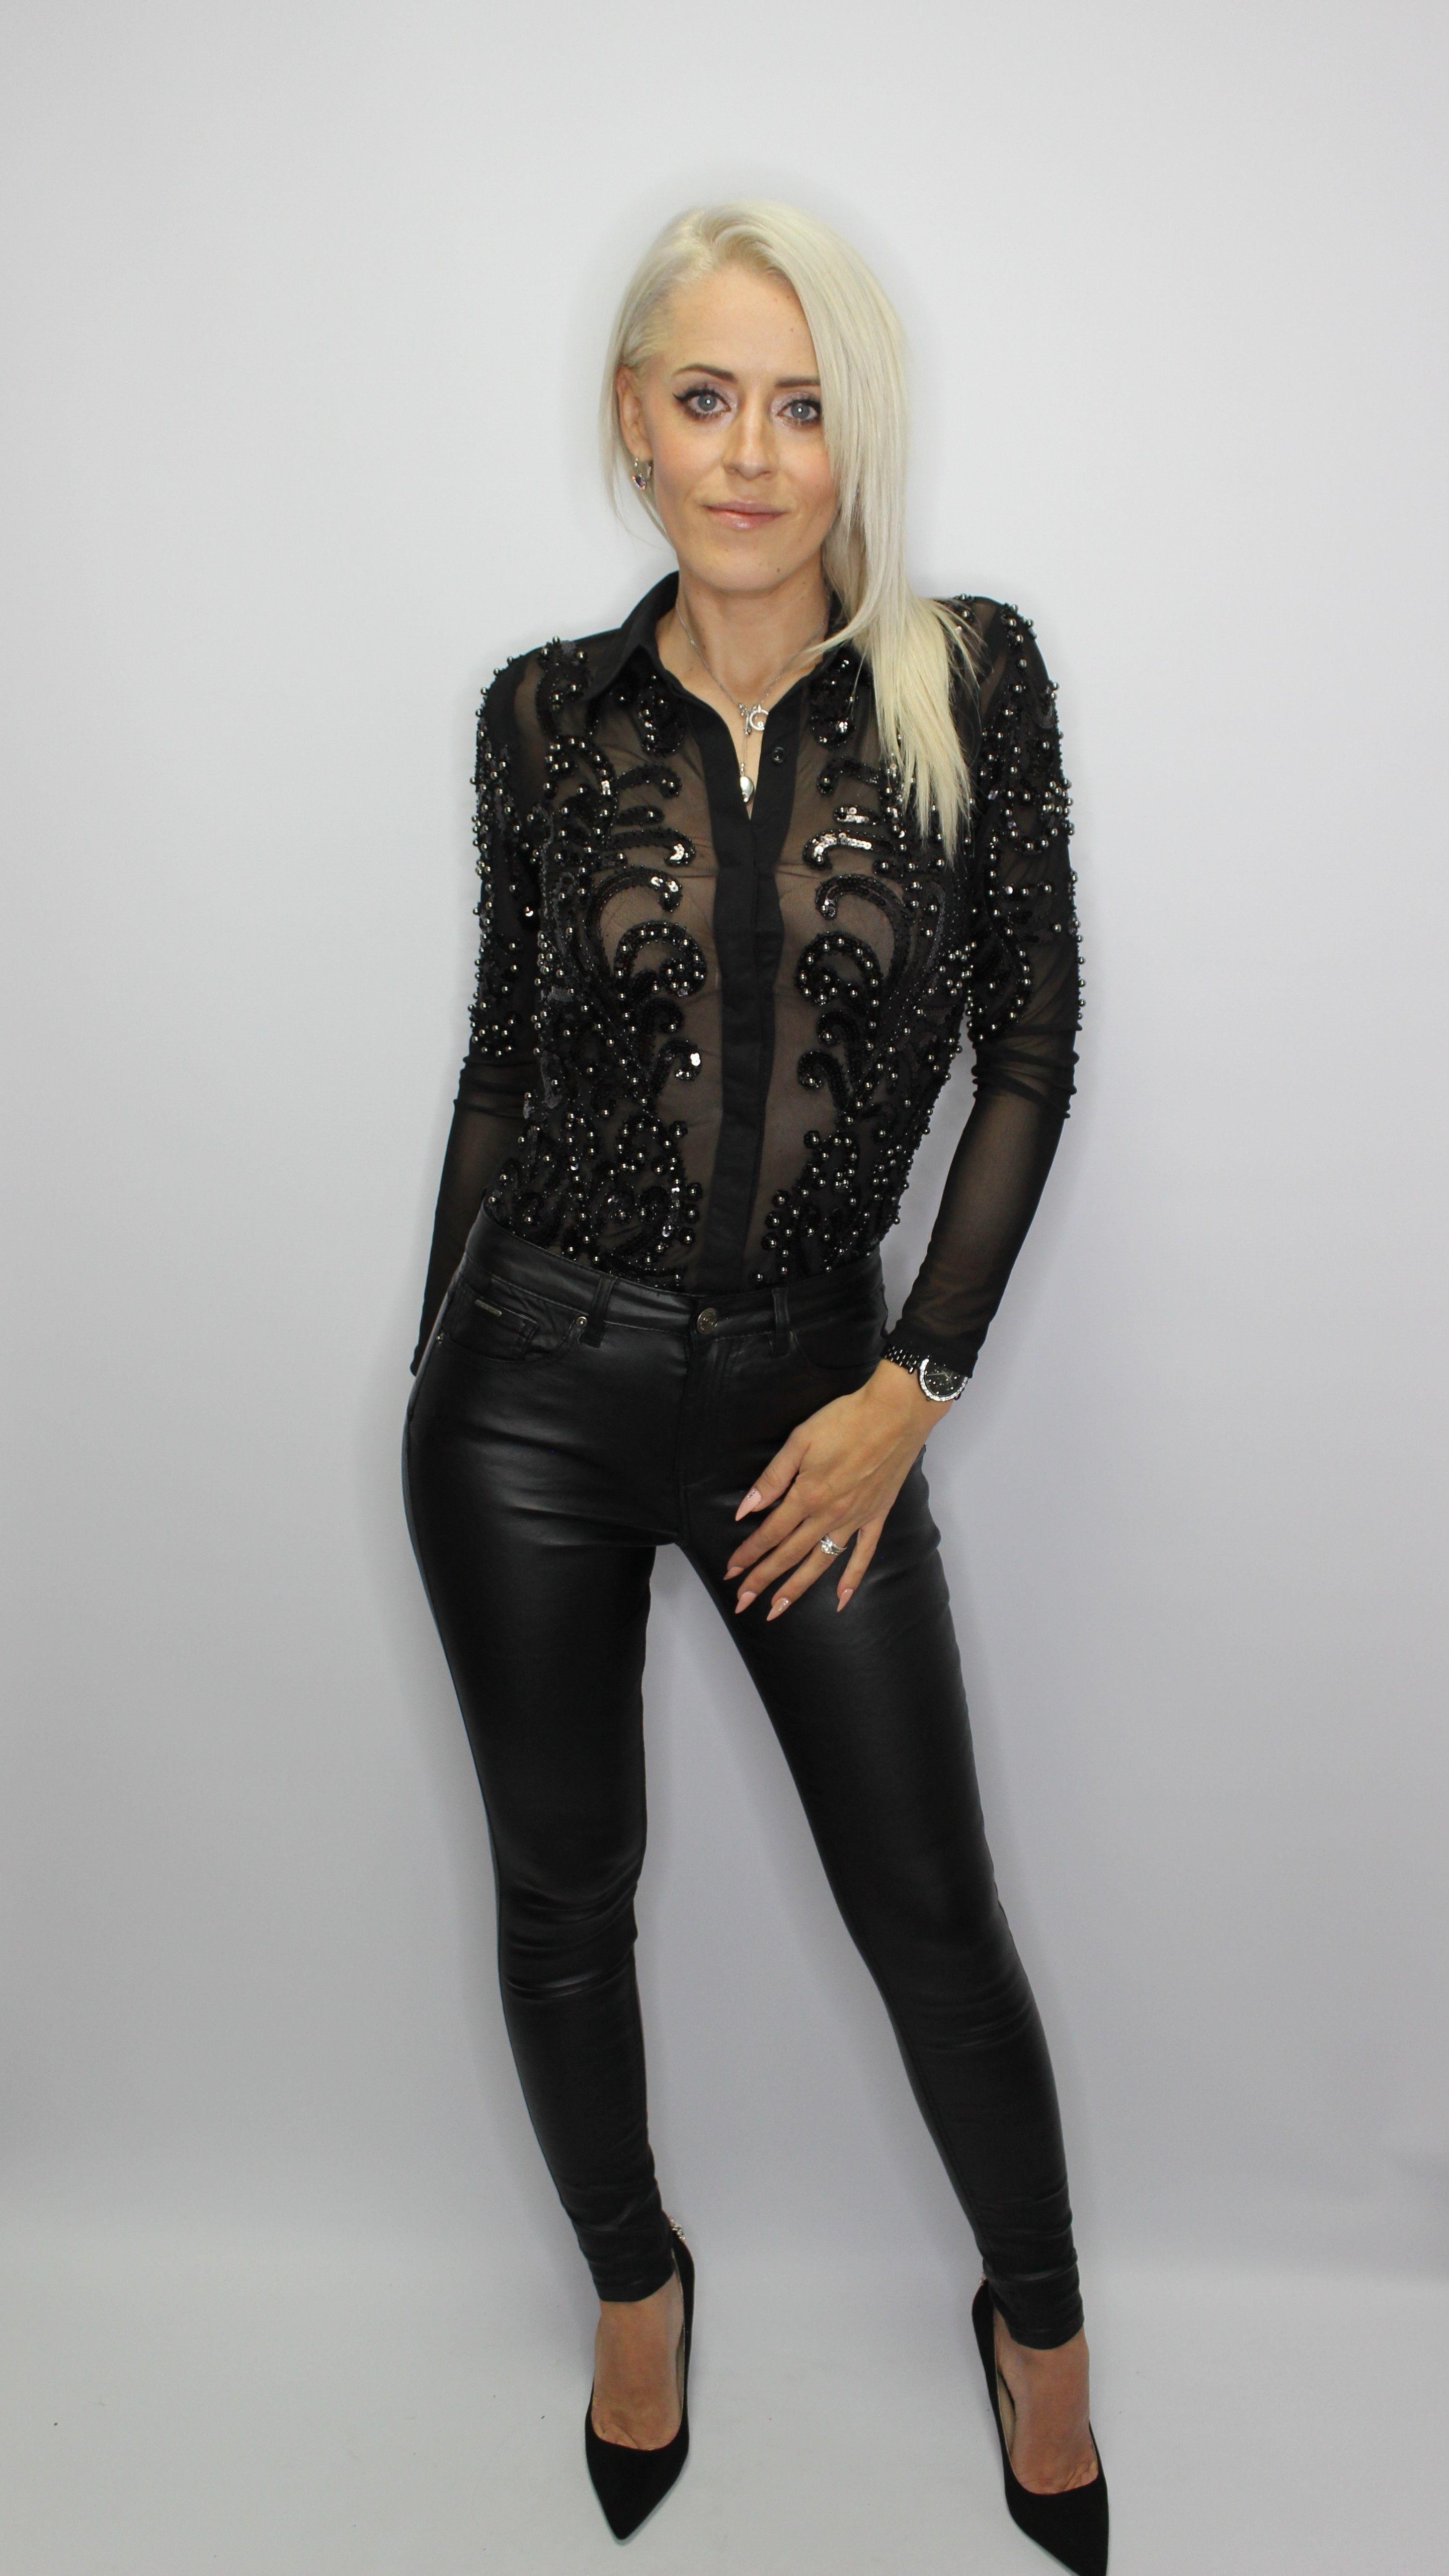 Black Sequin Bodysuit